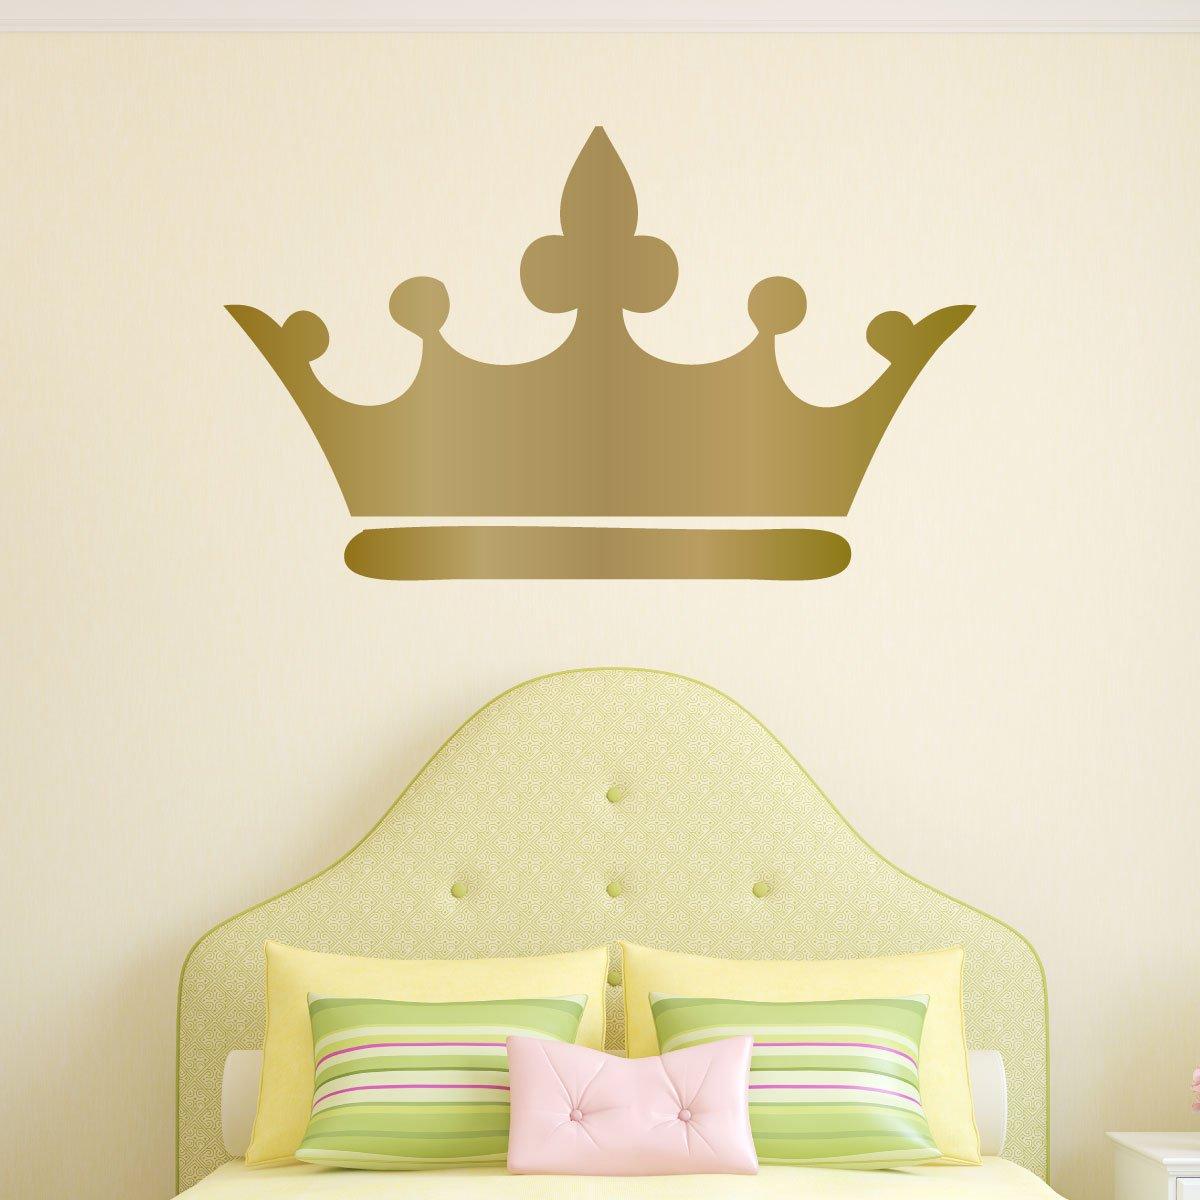 Amazon.com: Princess Crown Wall Decal - Vinyl Decorative Sticker ...